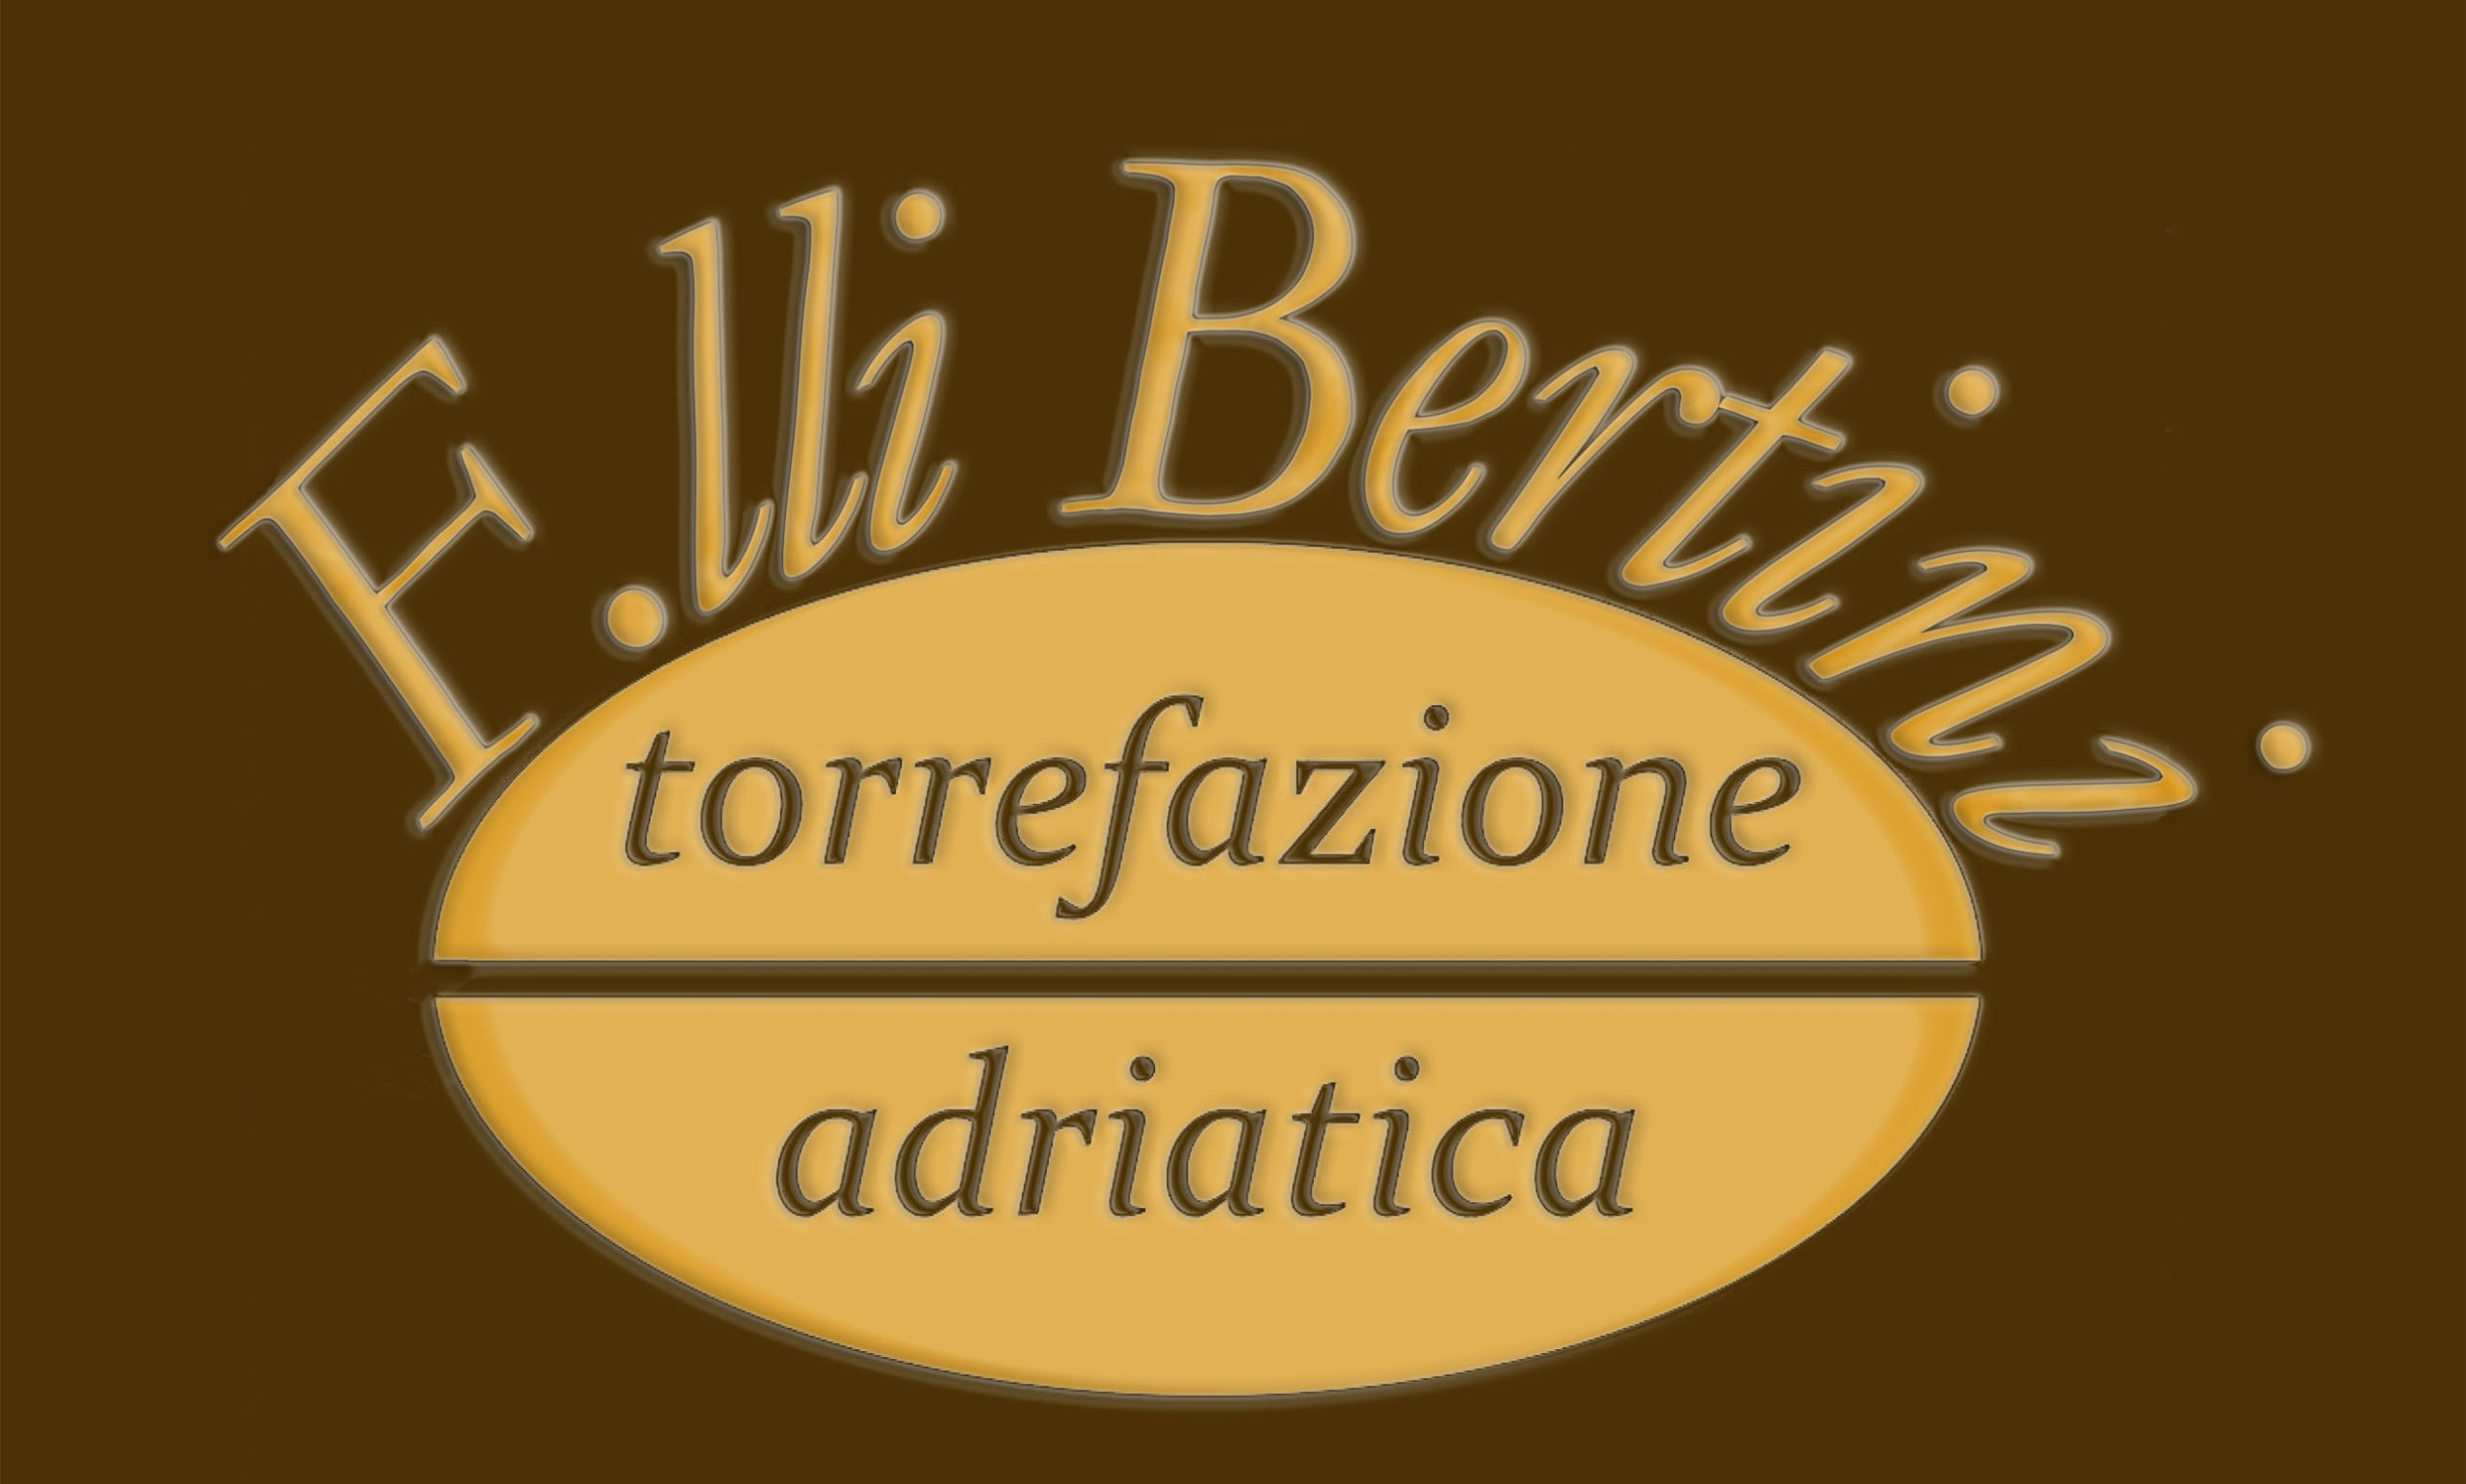 Fratelli Bertini